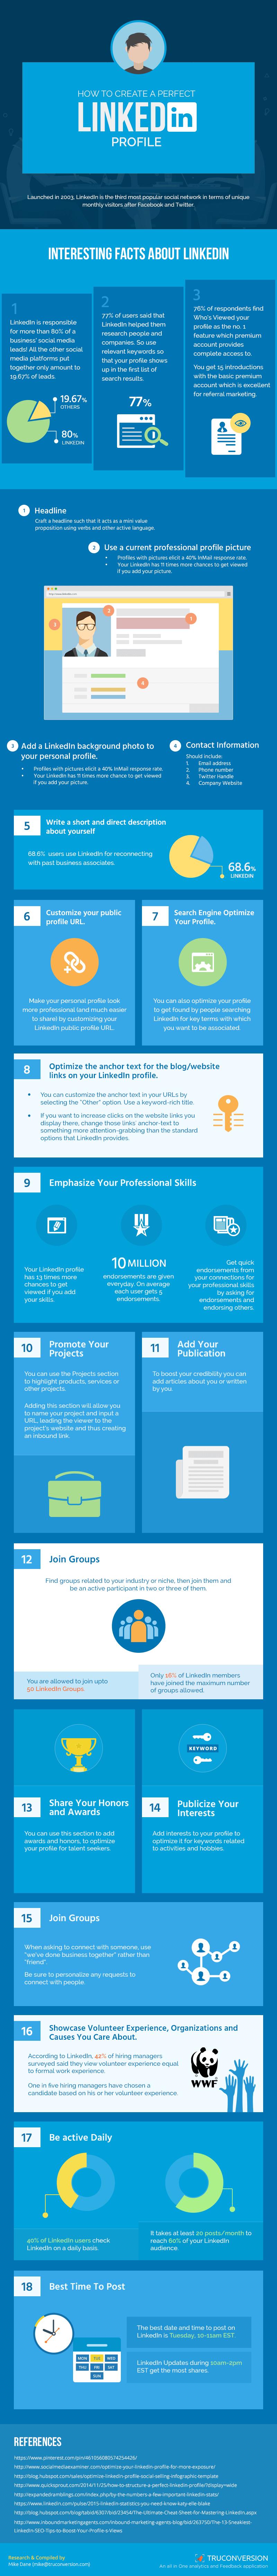 Perfil LinkedIn | Posicionamiento web webposicionamiento.eu